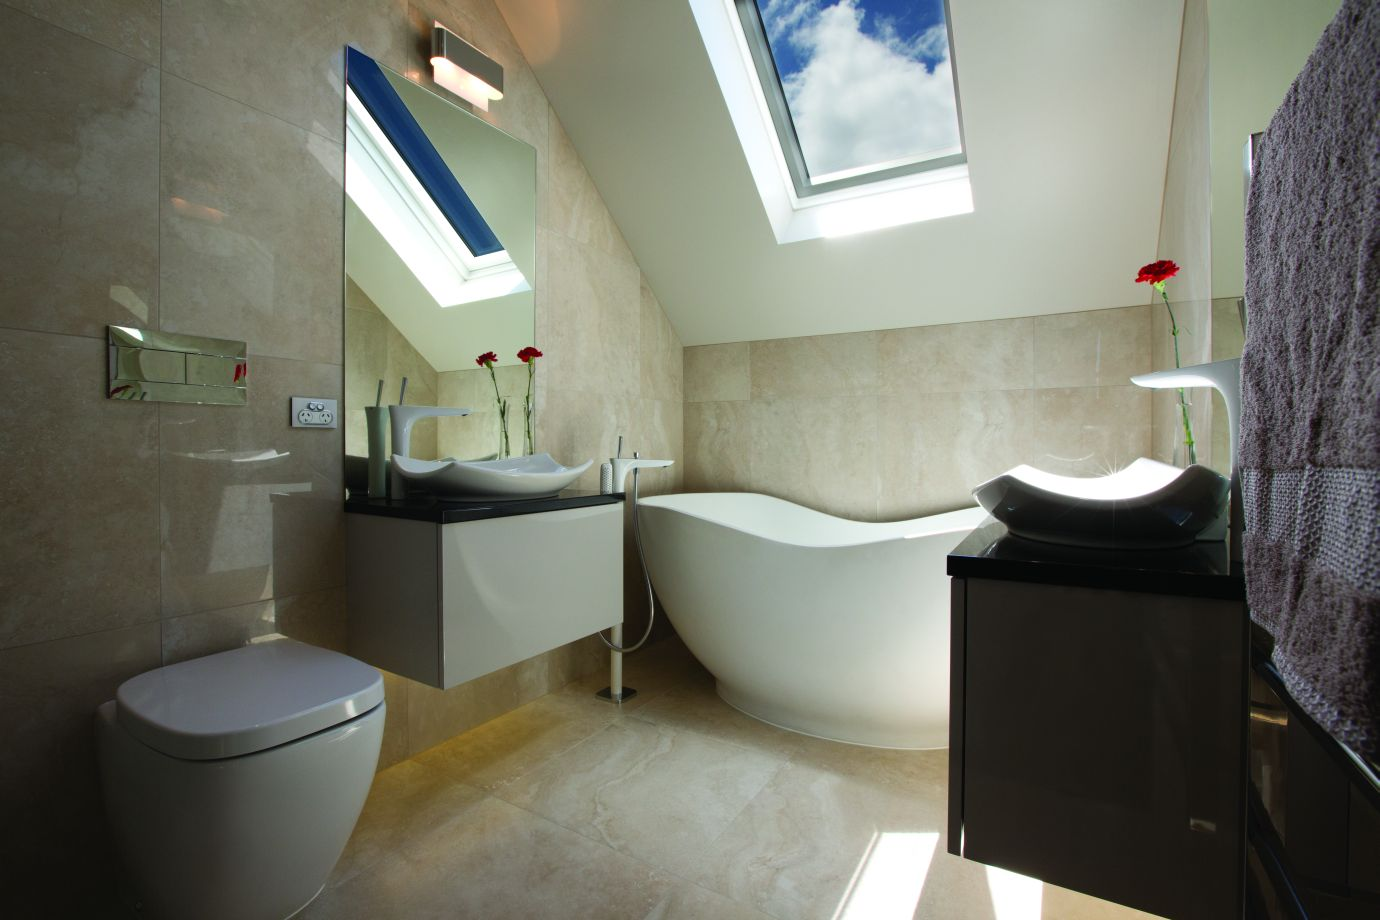 Travertino Bone Bathroom porcelain floor and wall tiles